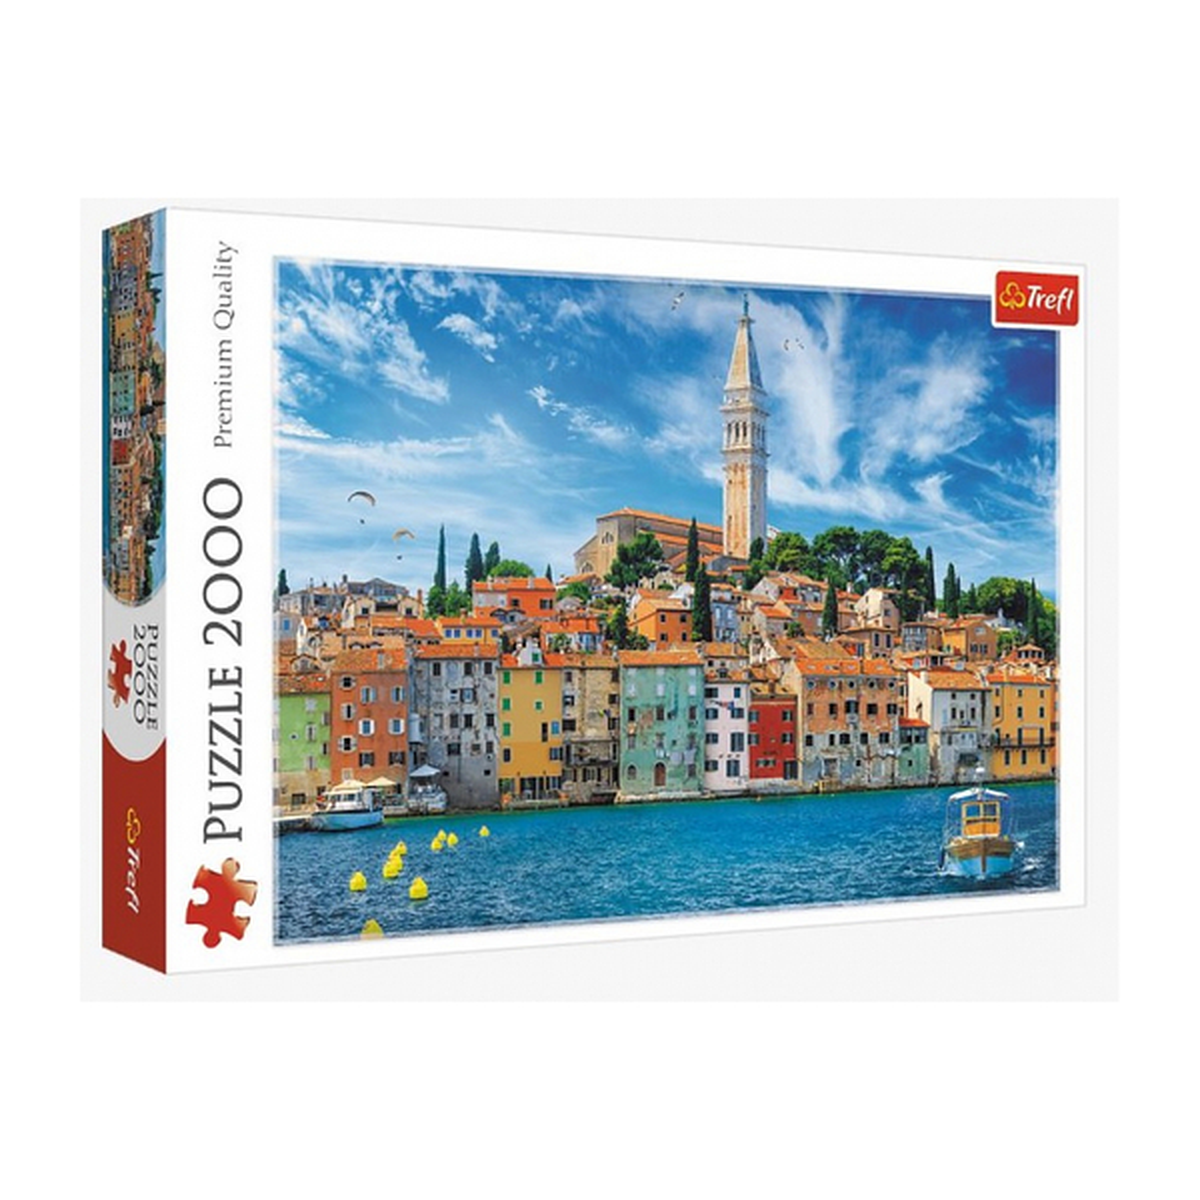 Trefl - Puzzle Rovinj Croatie 2000 pieces